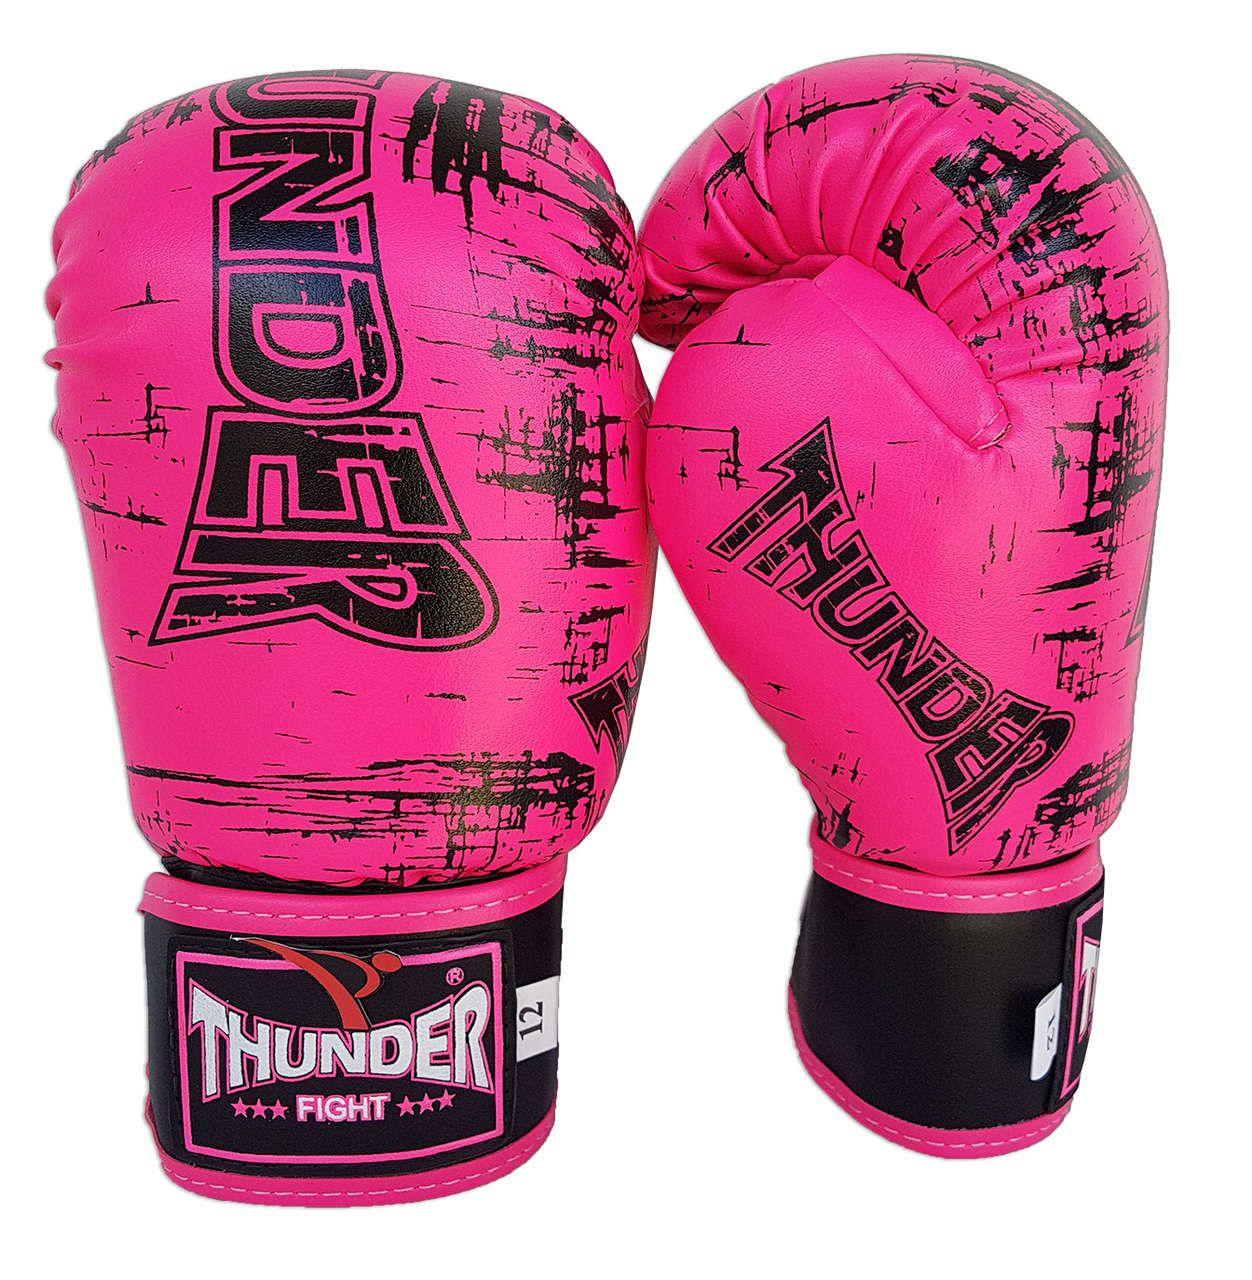 Luva de Boxe / Muay Thai 12oz Feminina - Rosa Riscado - Thunder Fight  - PRALUTA SHOP